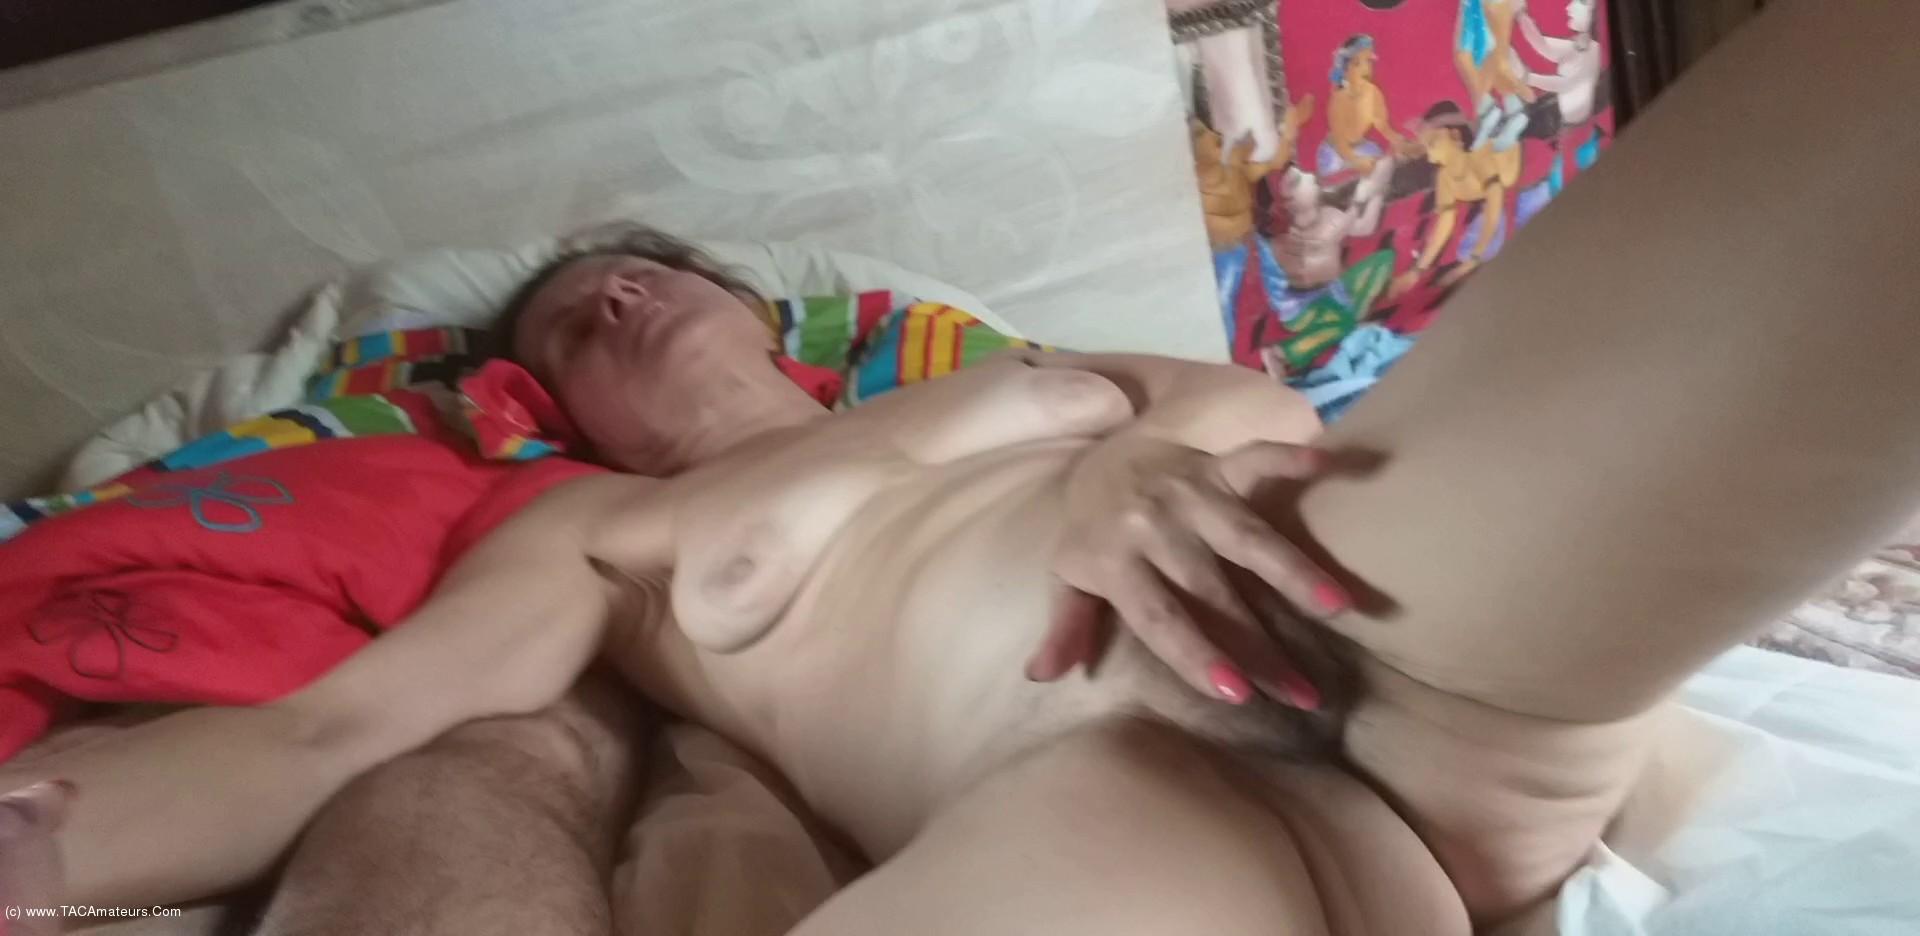 DianaAnanta - Cunt vs Dick scene 1